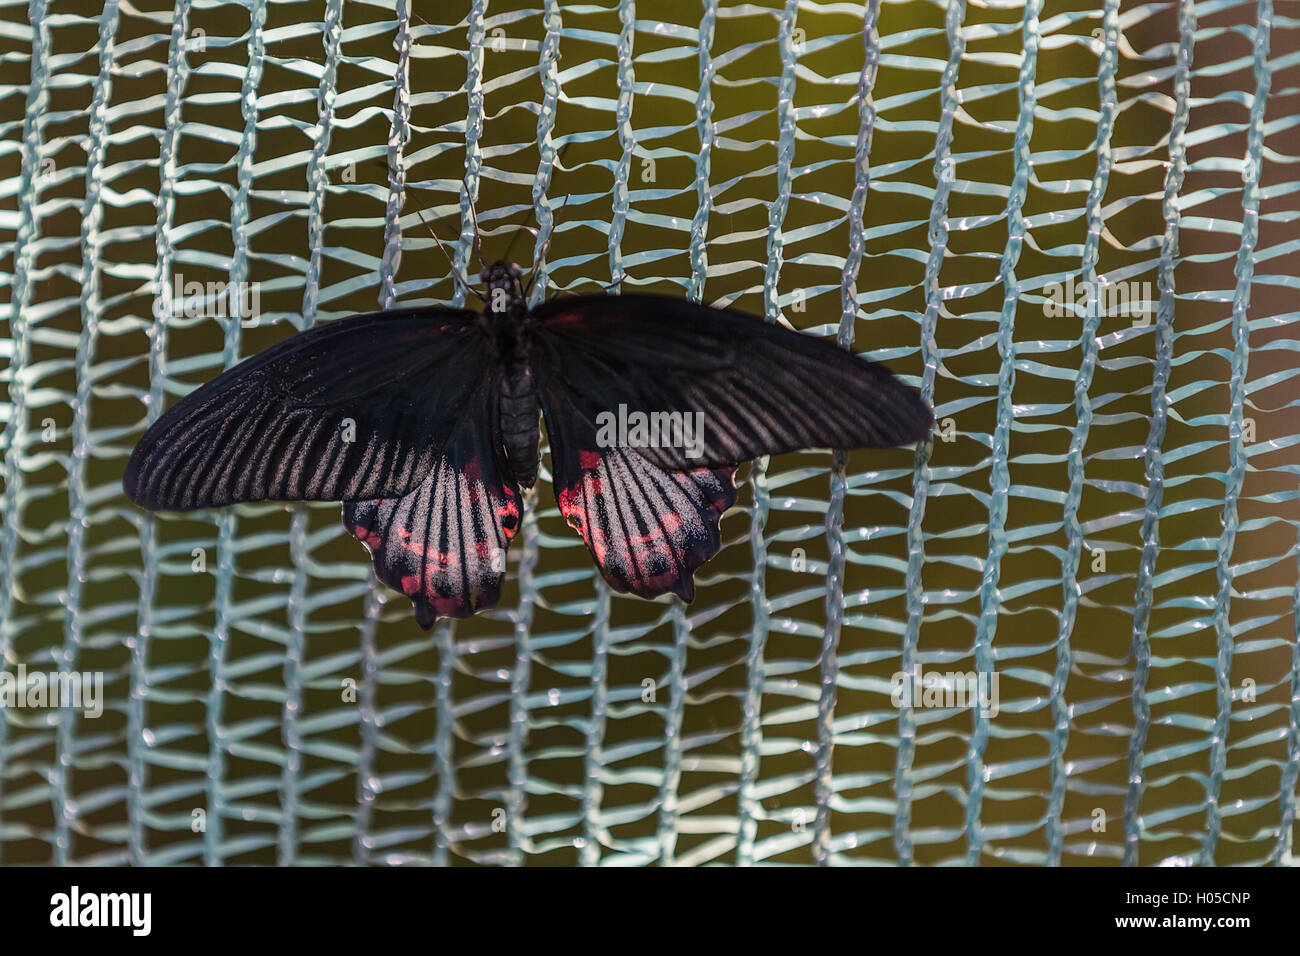 Scarlet mormone (Papilio rumanzovia), maschio Immagini Stock